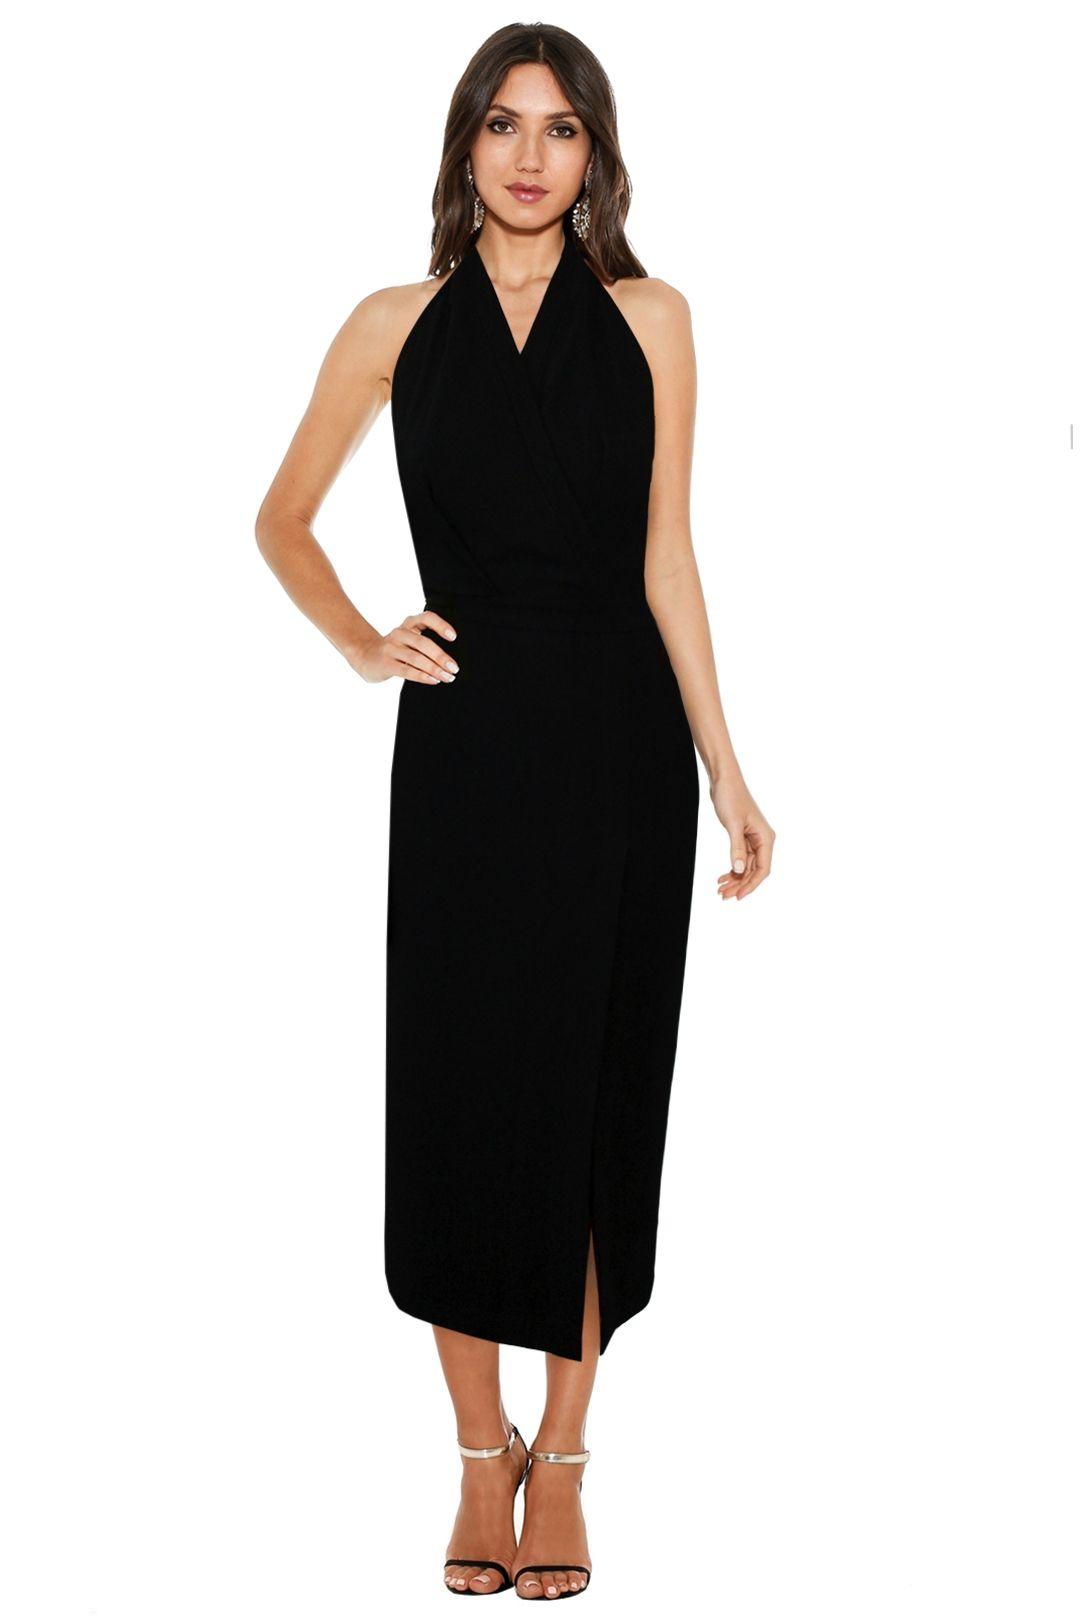 Dion Lee Line II - Soft Lace Dress in Black - Black - Front